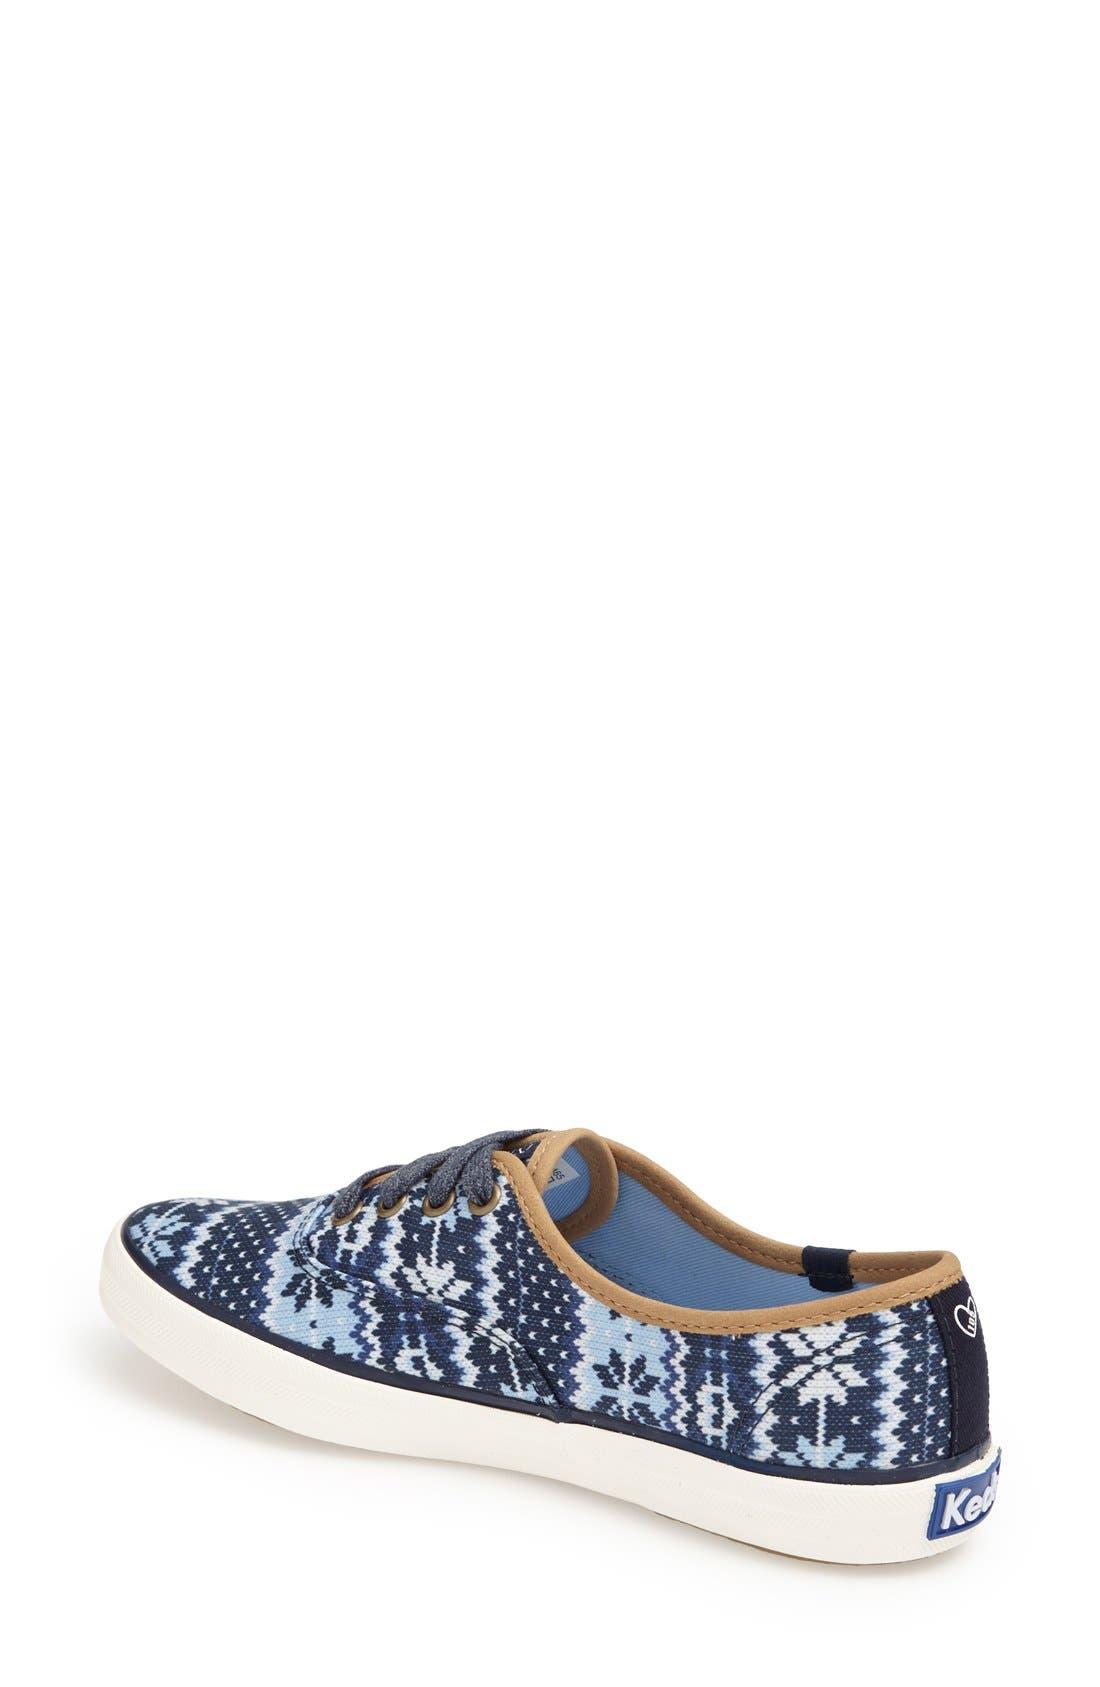 Alternate Image 2  - Keds® Taylor Swift 'Champion - Fair Isle' Sneaker (Women)